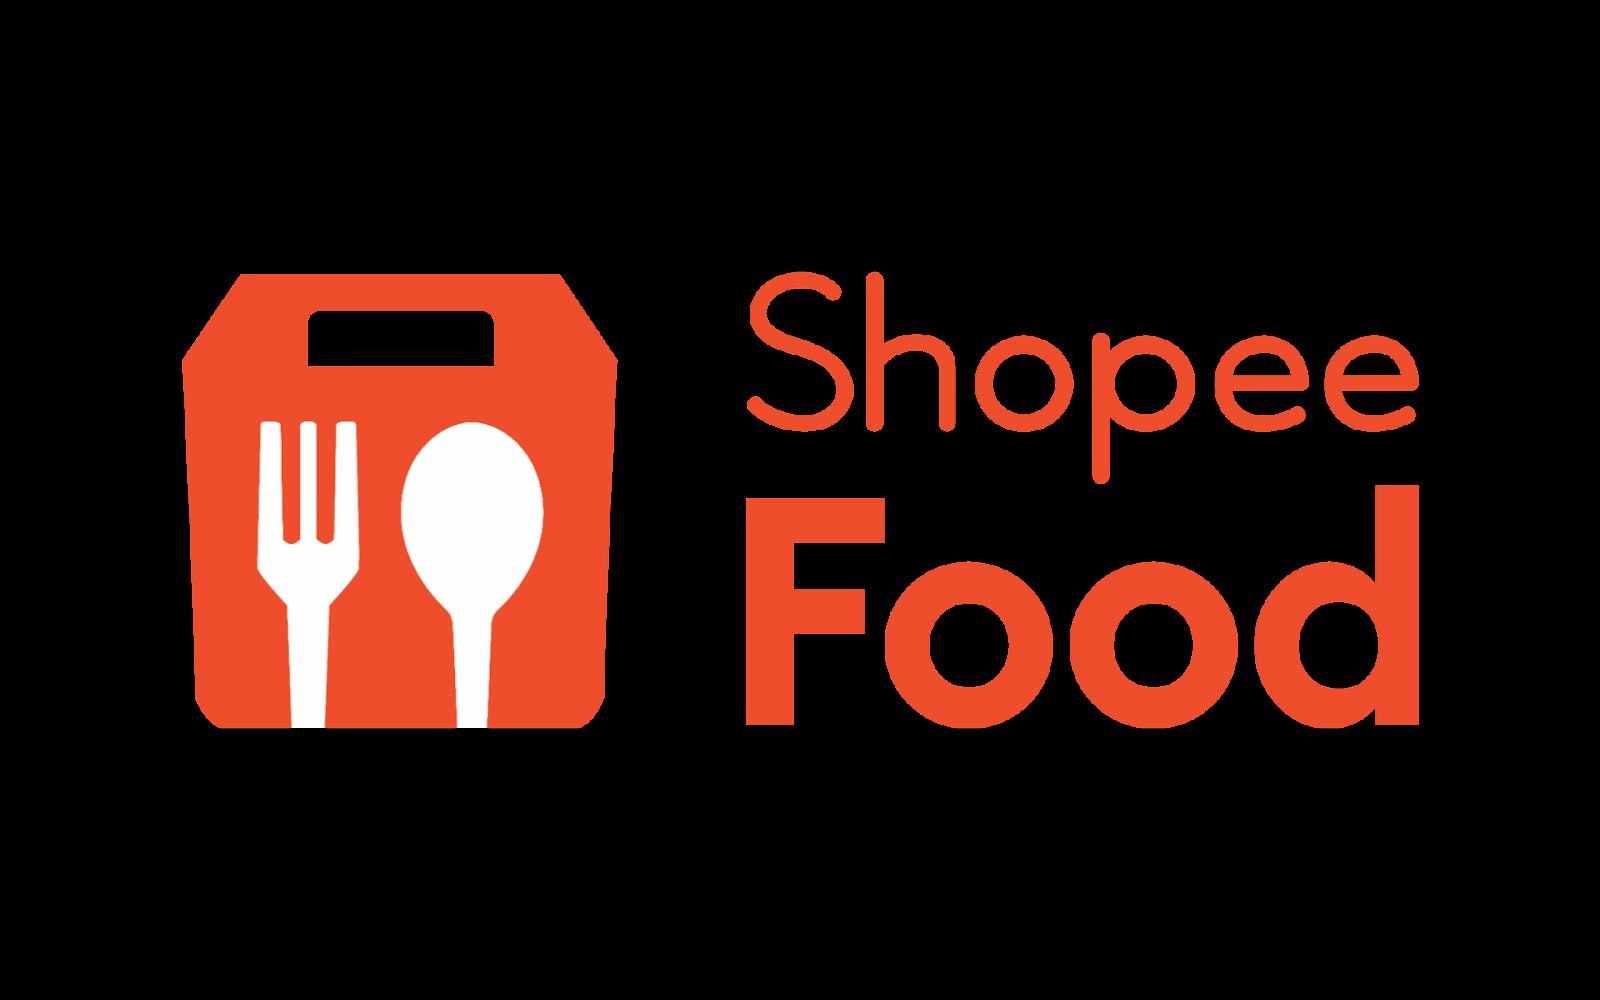 Logo Shopee Food Format PNG